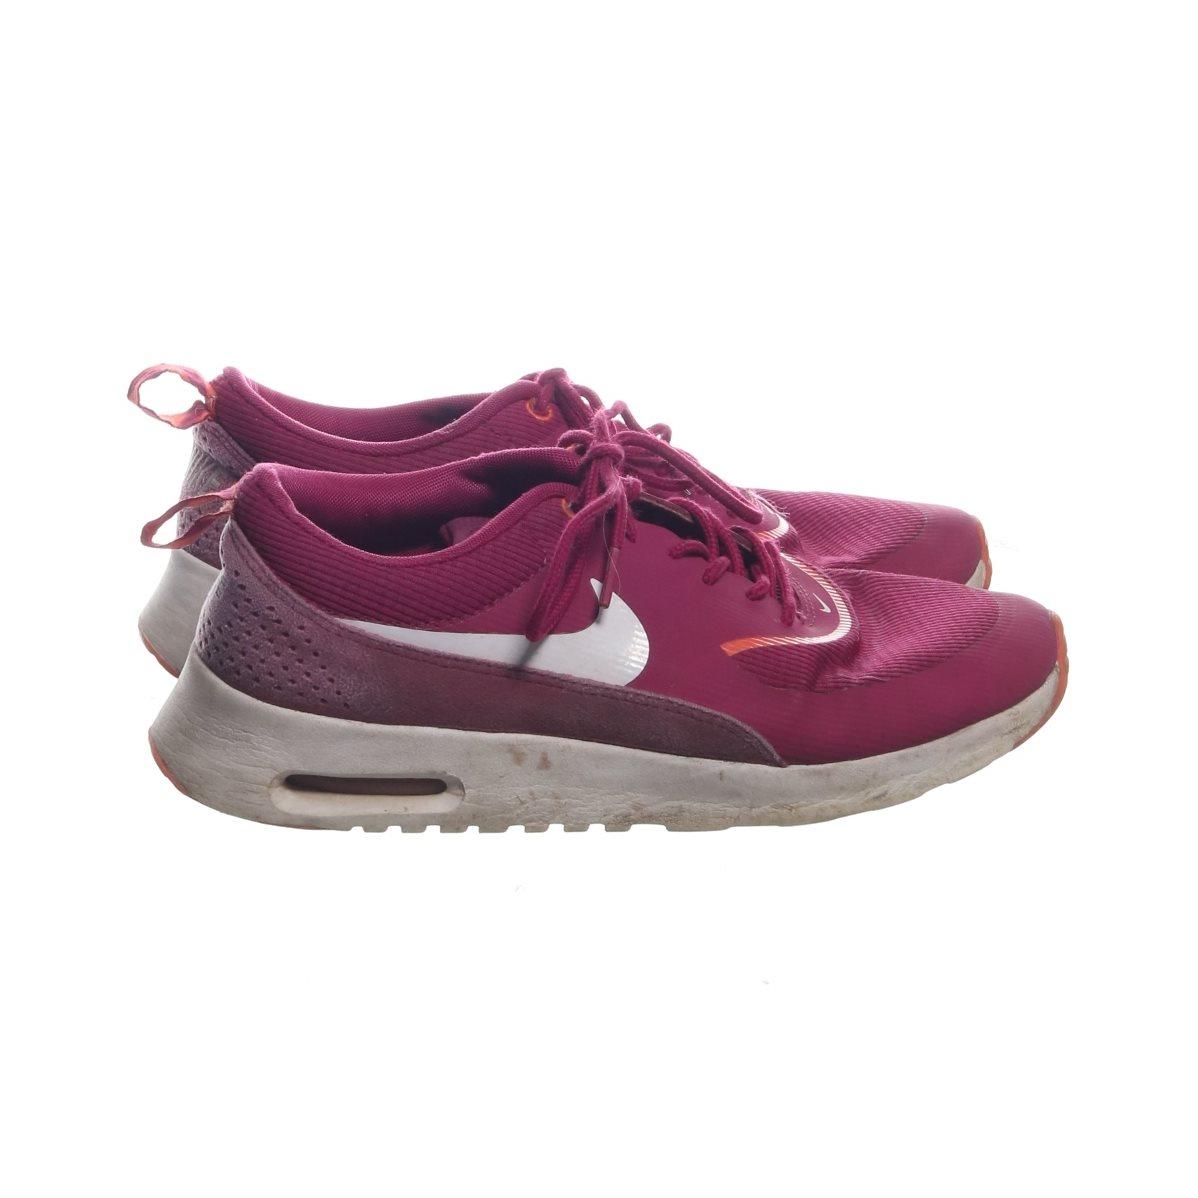 timeless design 34b0f fd4a1 Nike, Sneakers, Strl 38, Air Max Thea, LilaOrange